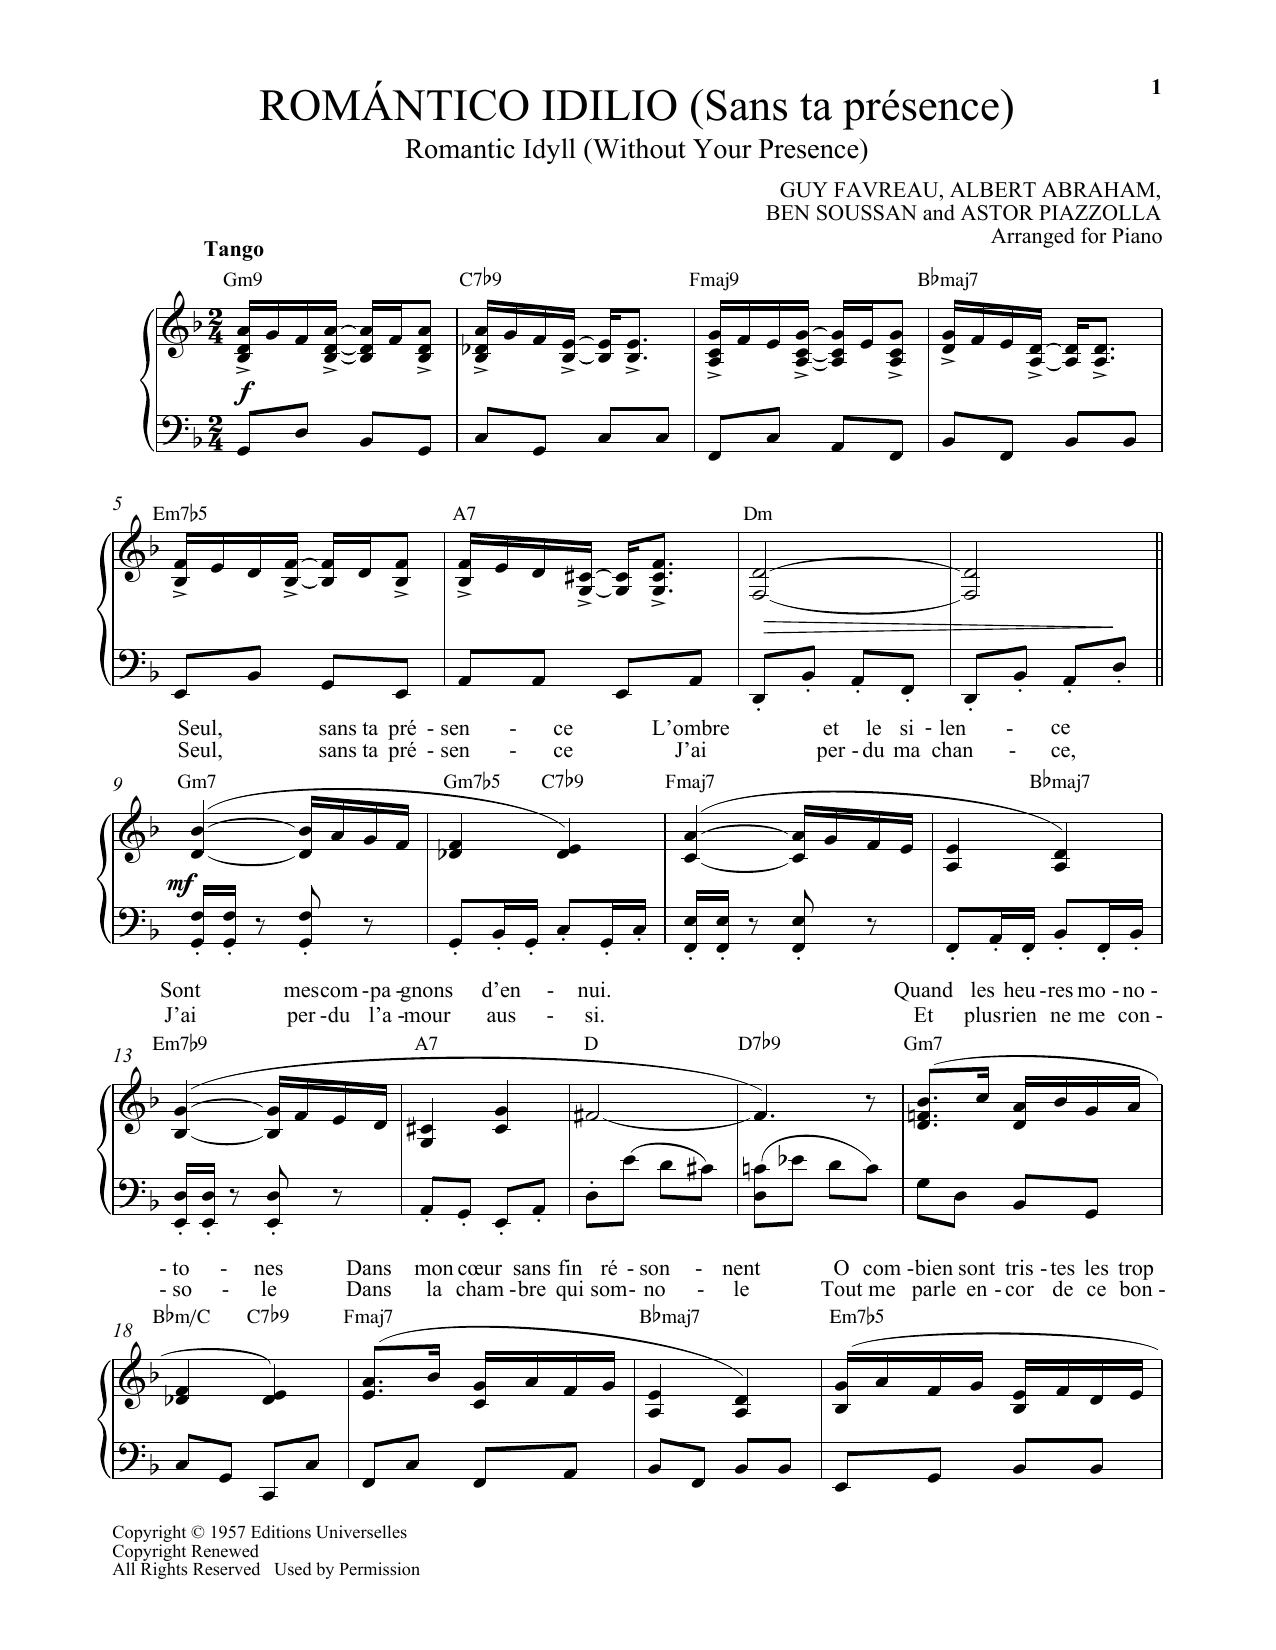 Romantico Idilio (Sans ta presence) Sheet Music